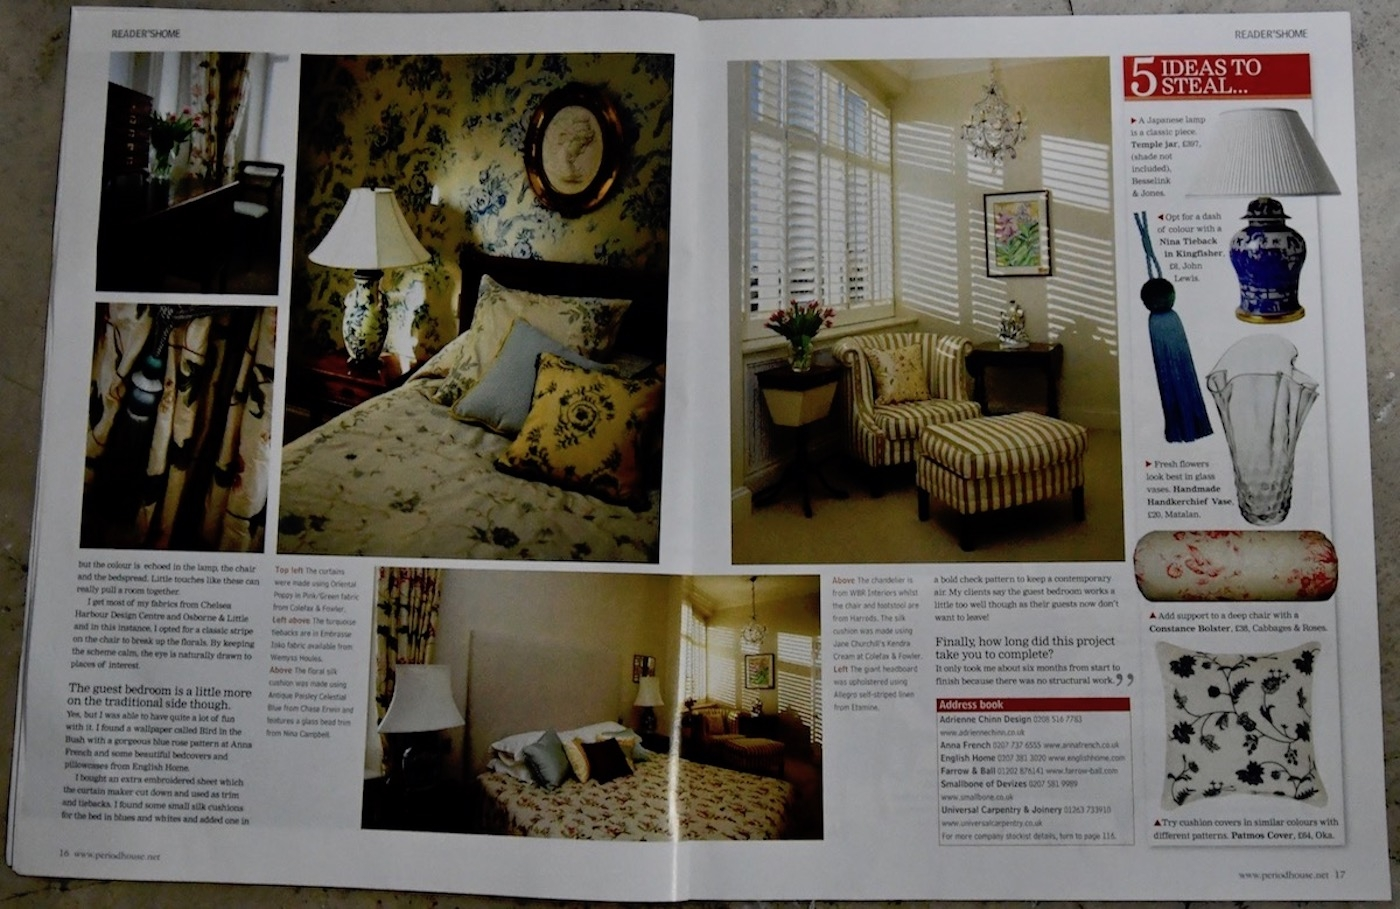 Period House Magazine, Kensington Park Gardens, London p4